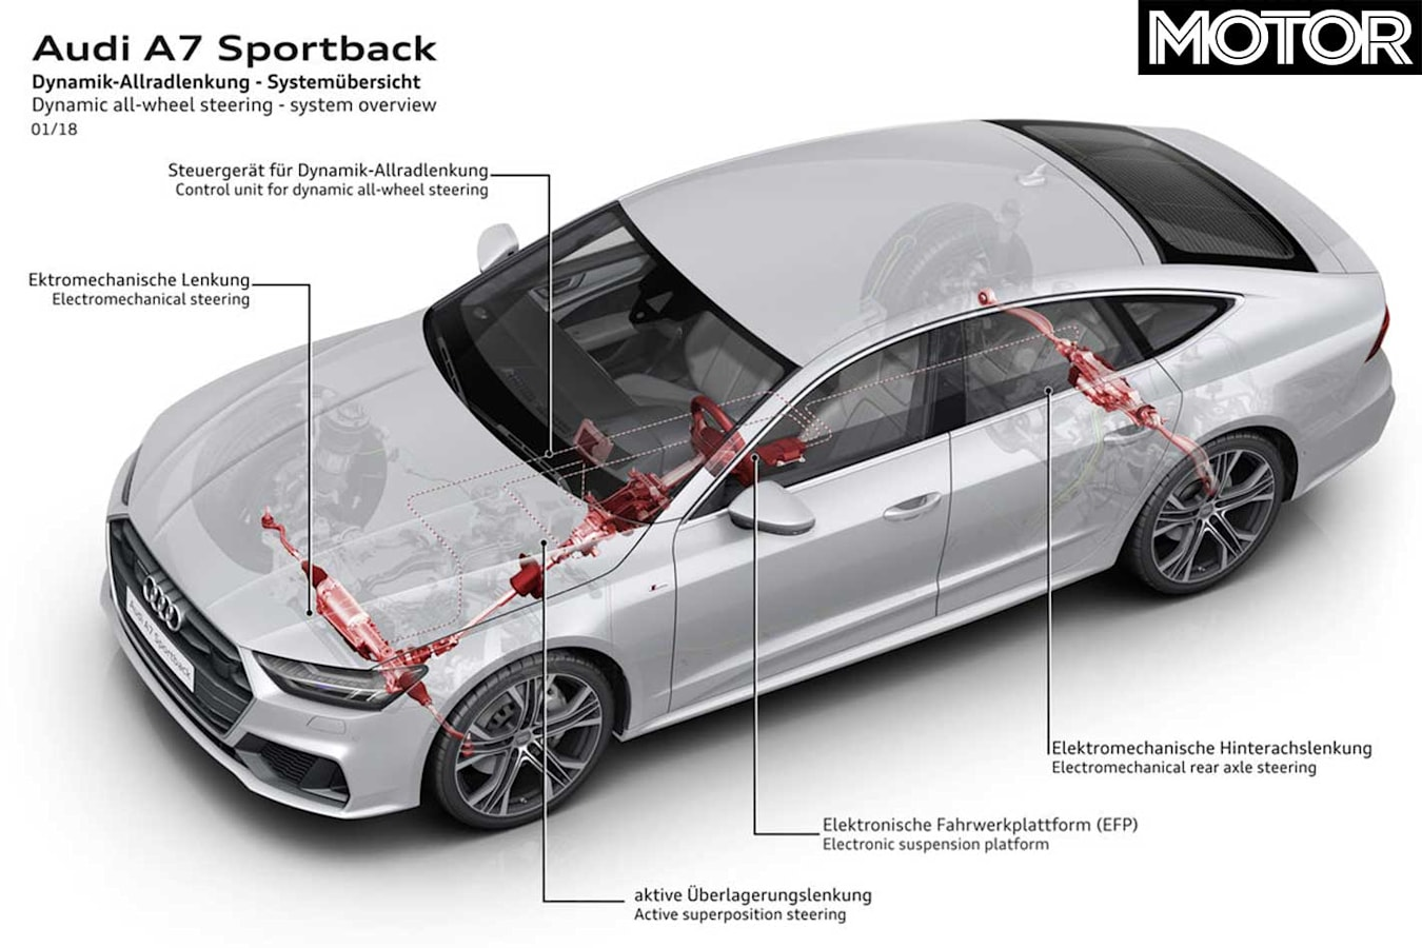 2019 Audi A 7 Sportback Dynamic Steering Diagram Jpg